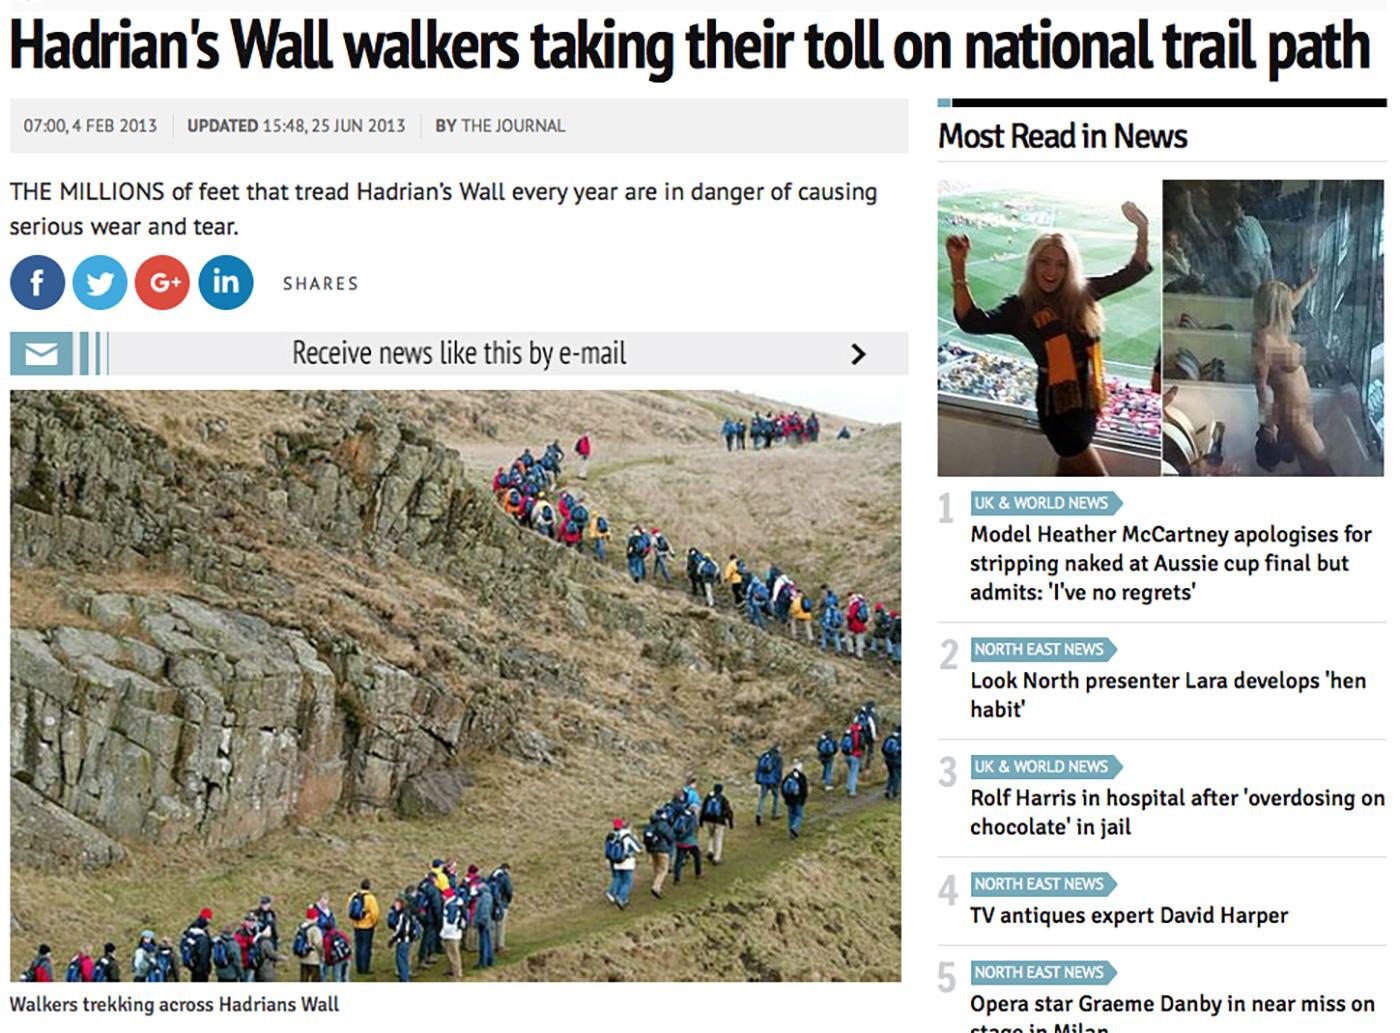 hadrians-wall-article.jpg